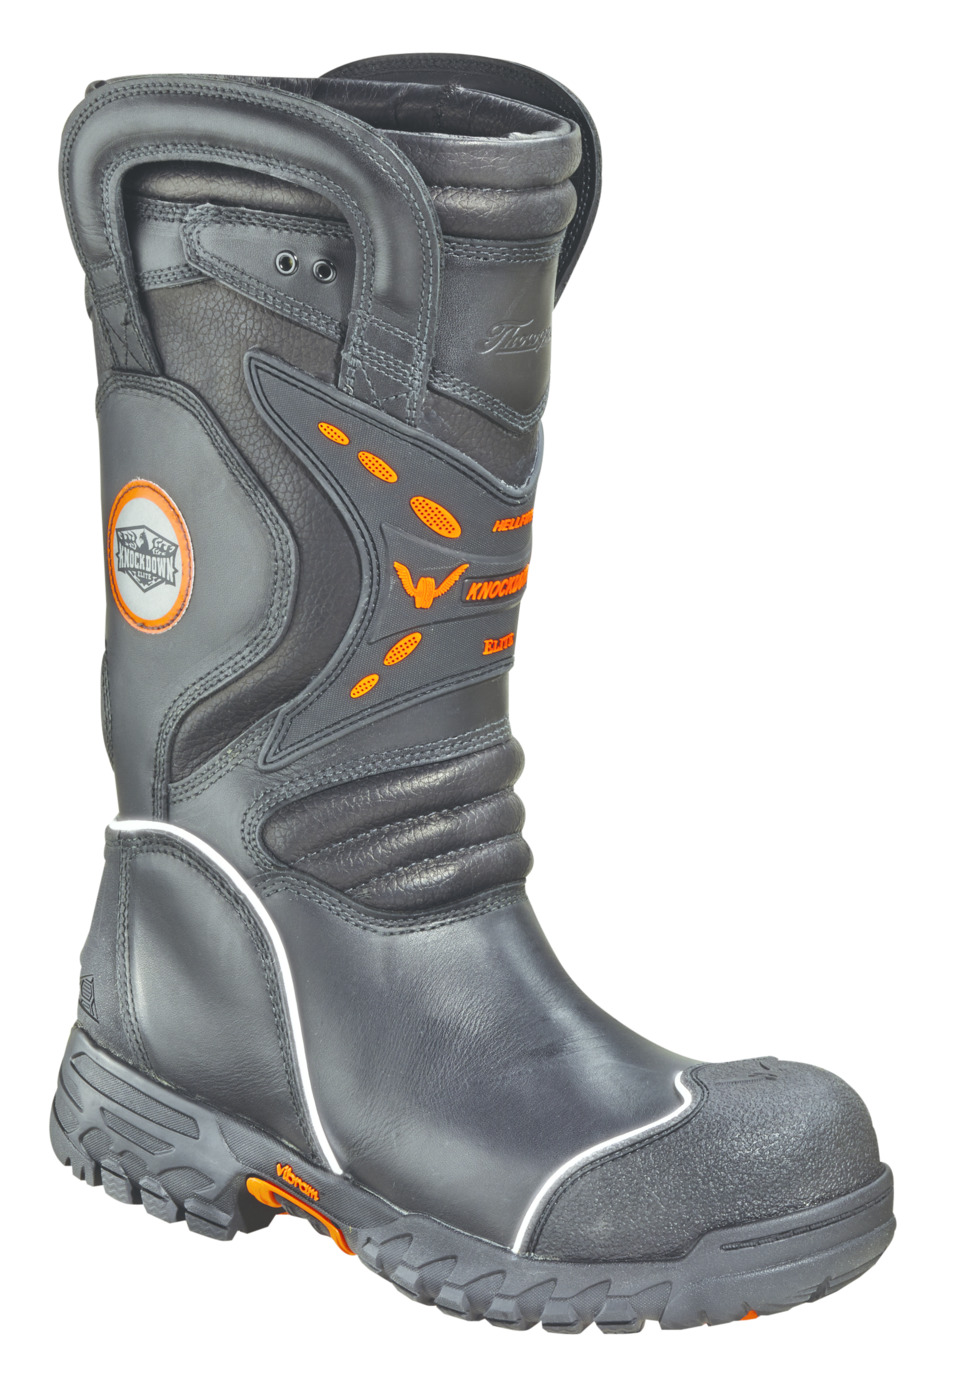 cfc47599387 Weinbrenner Shoe Co. Knockdown Elite Boots for structural ...